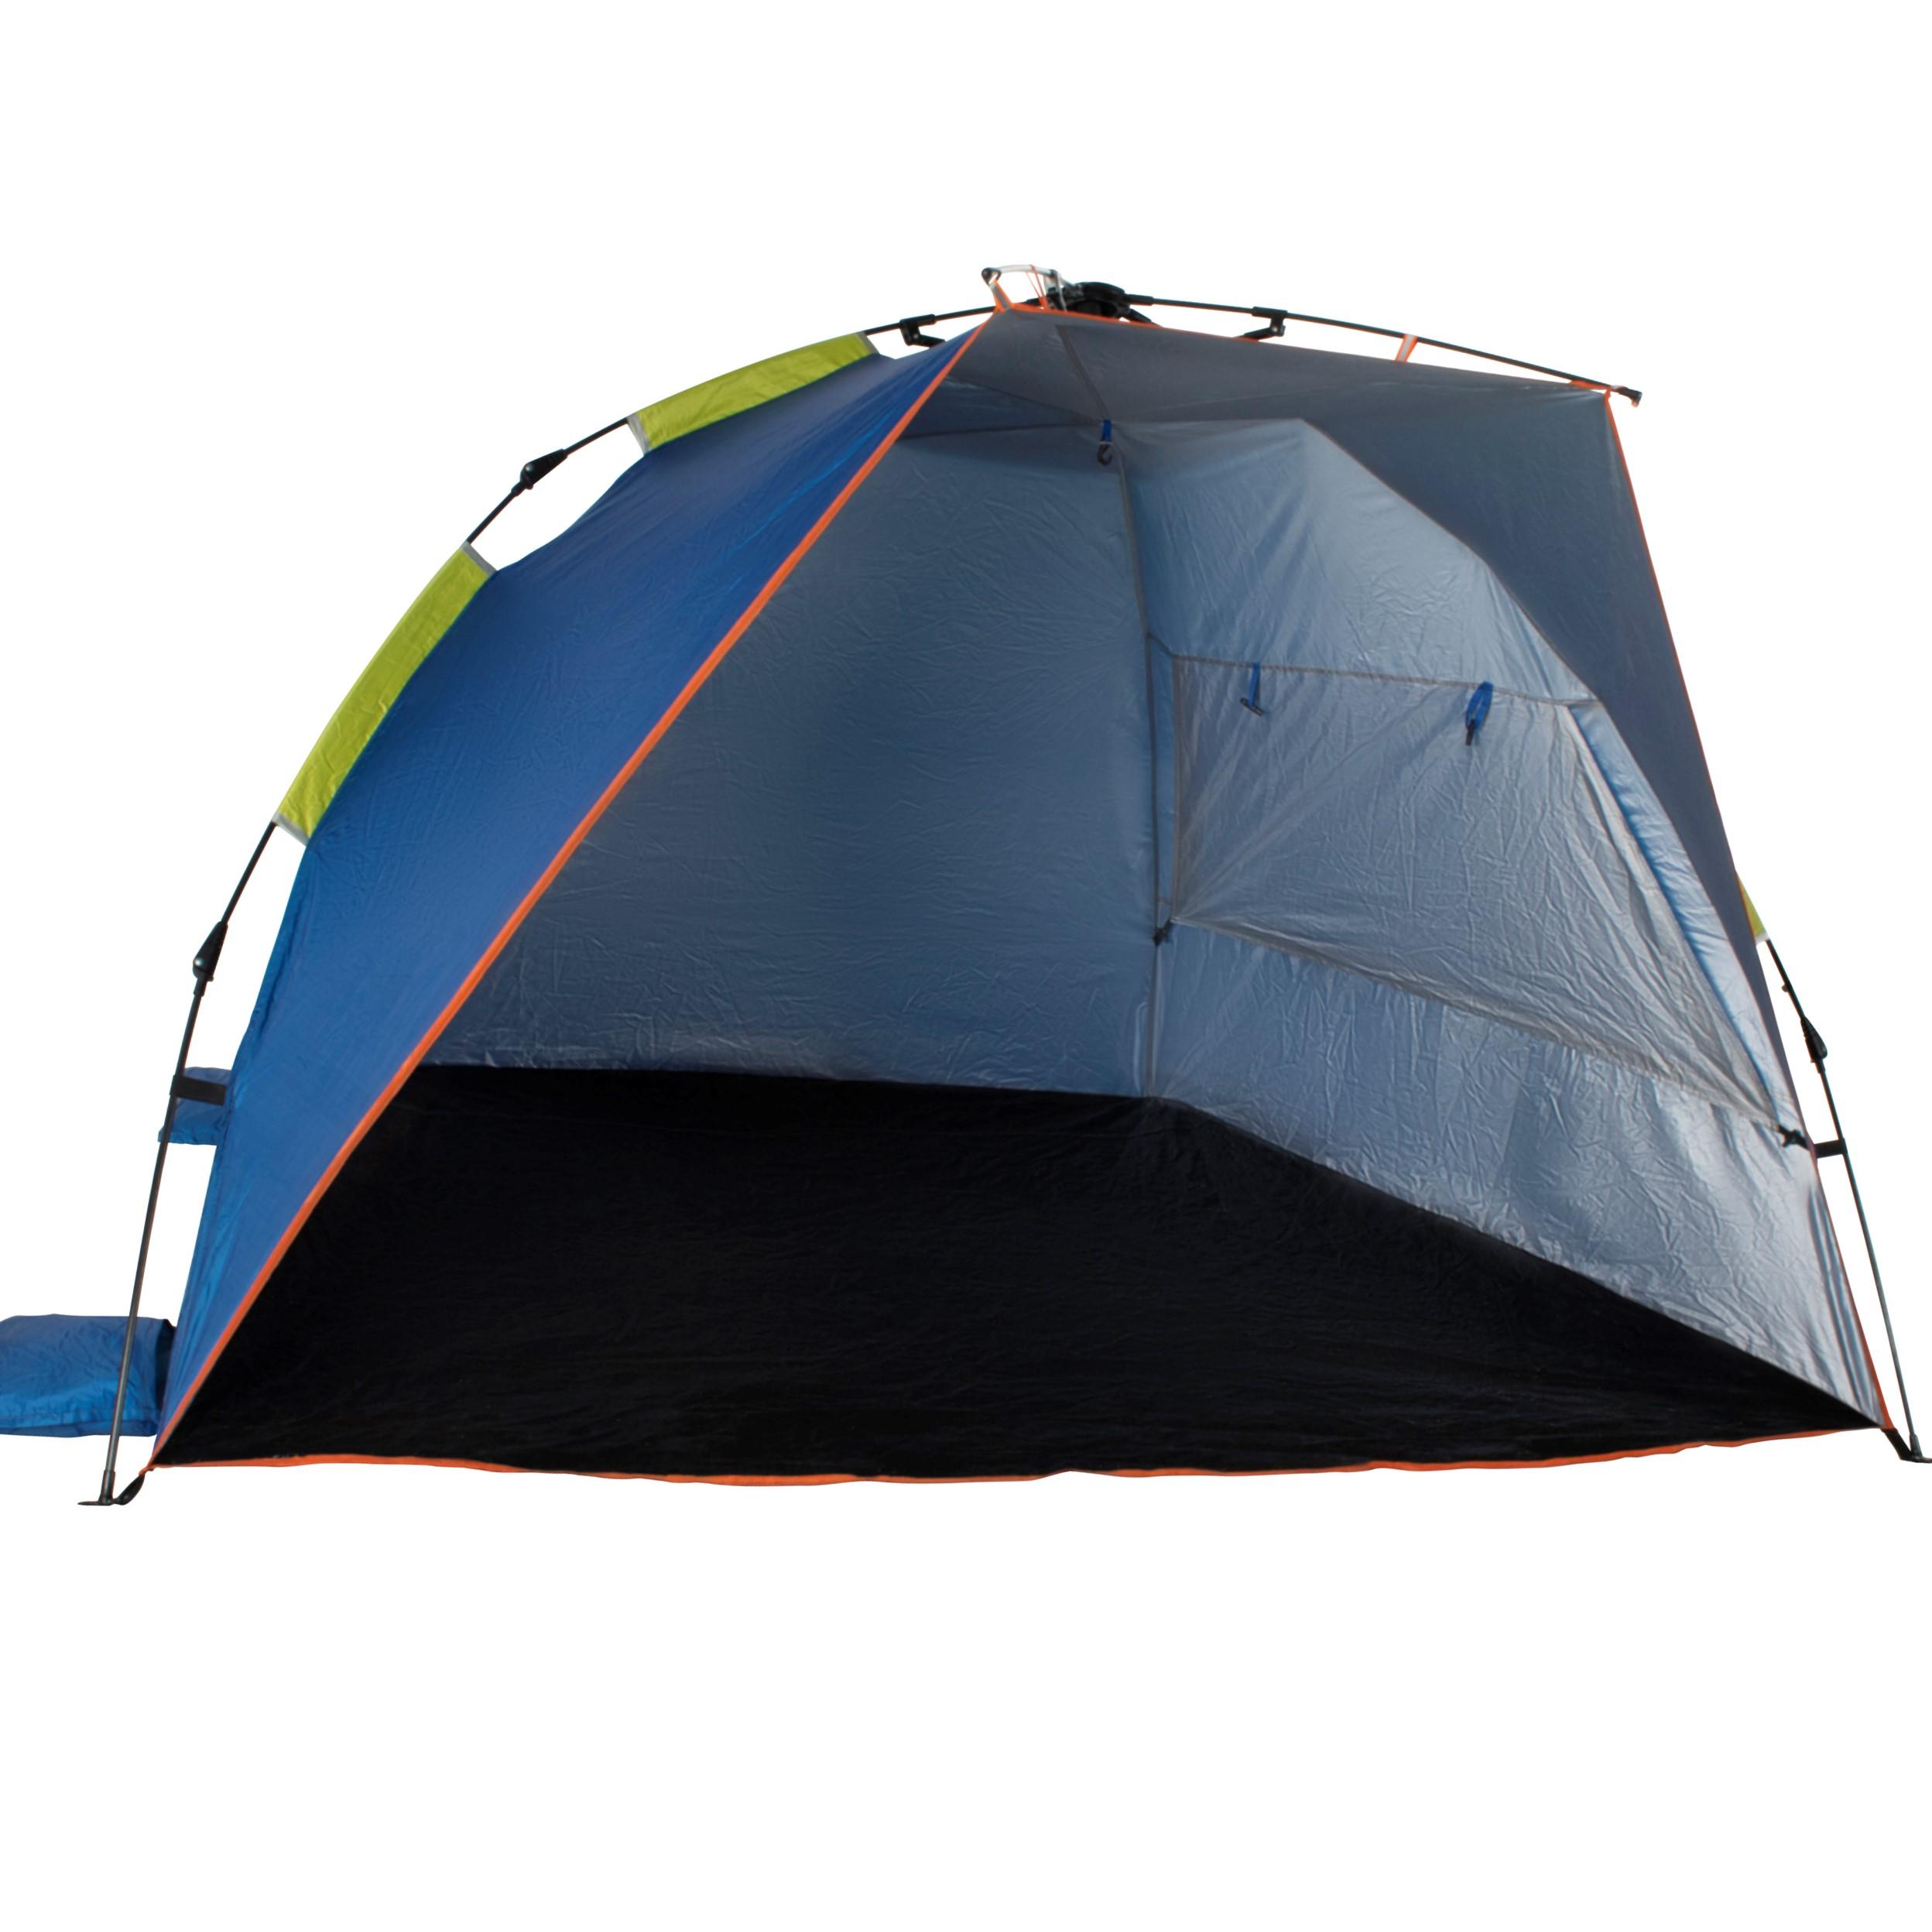 "98""x47"" Bliss Hammocks Beach Tent $25 + Free Shipping w/ Walmart+ or Orders $35+."